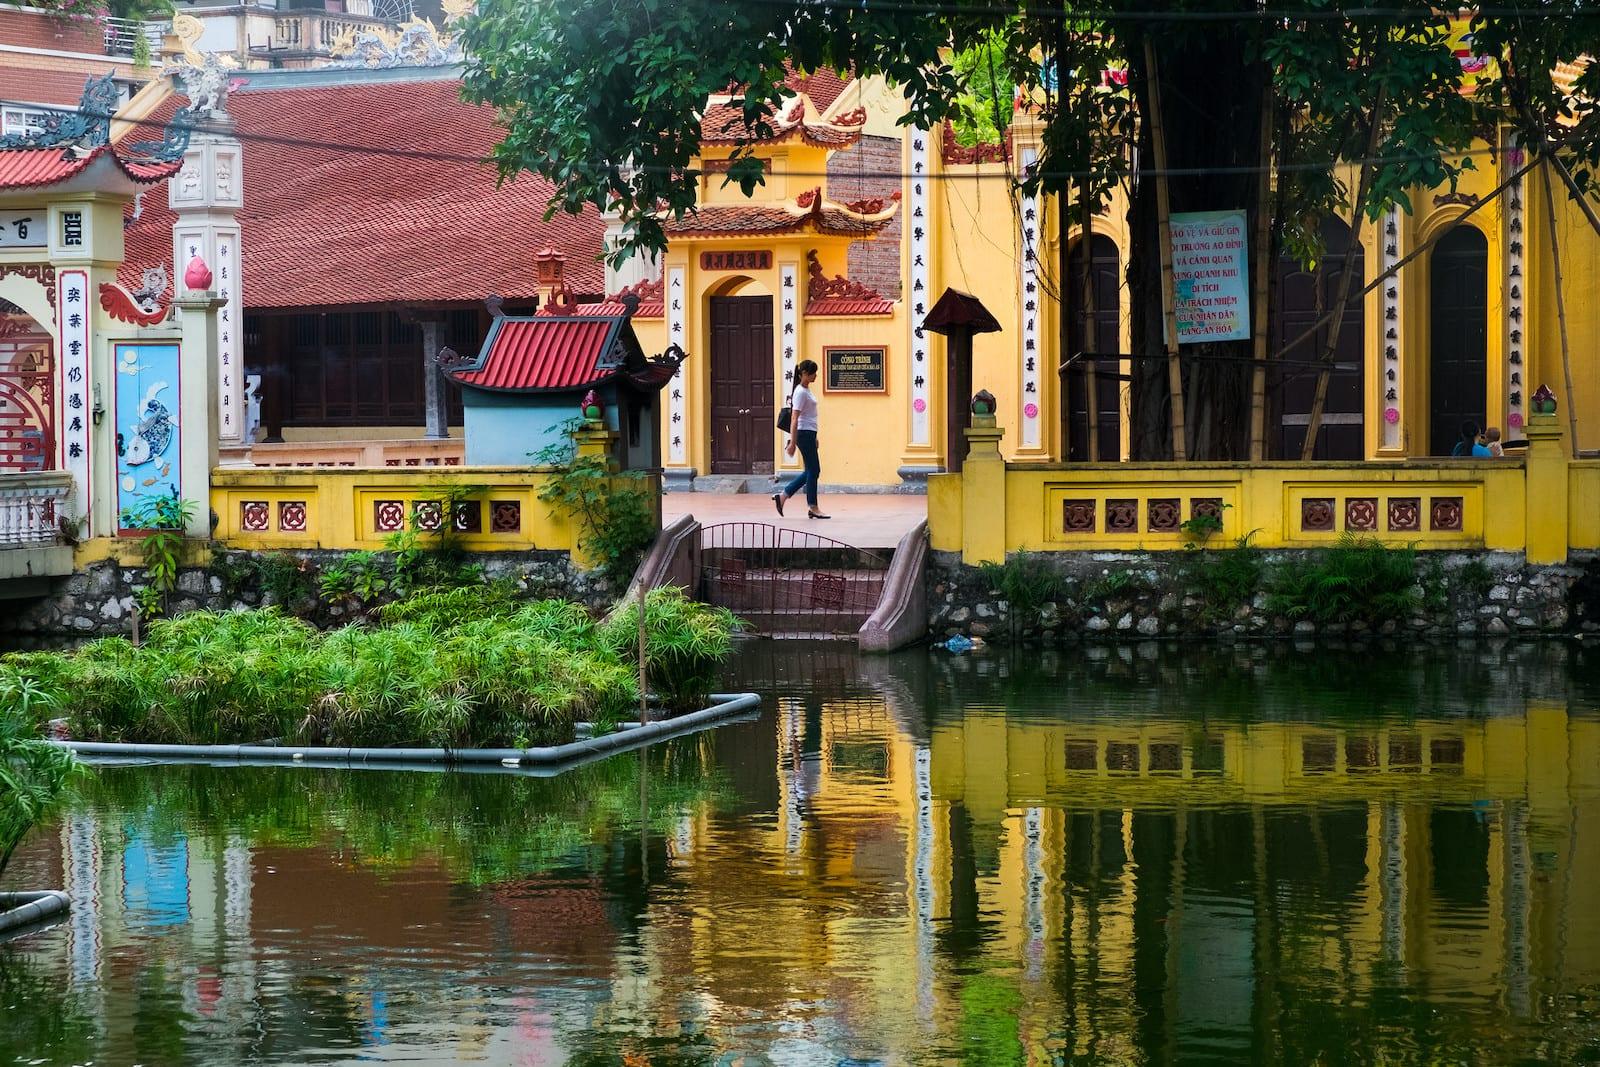 Vietnamese woman walking though the temple at Cong Vien, Cau Giay, Hanoi